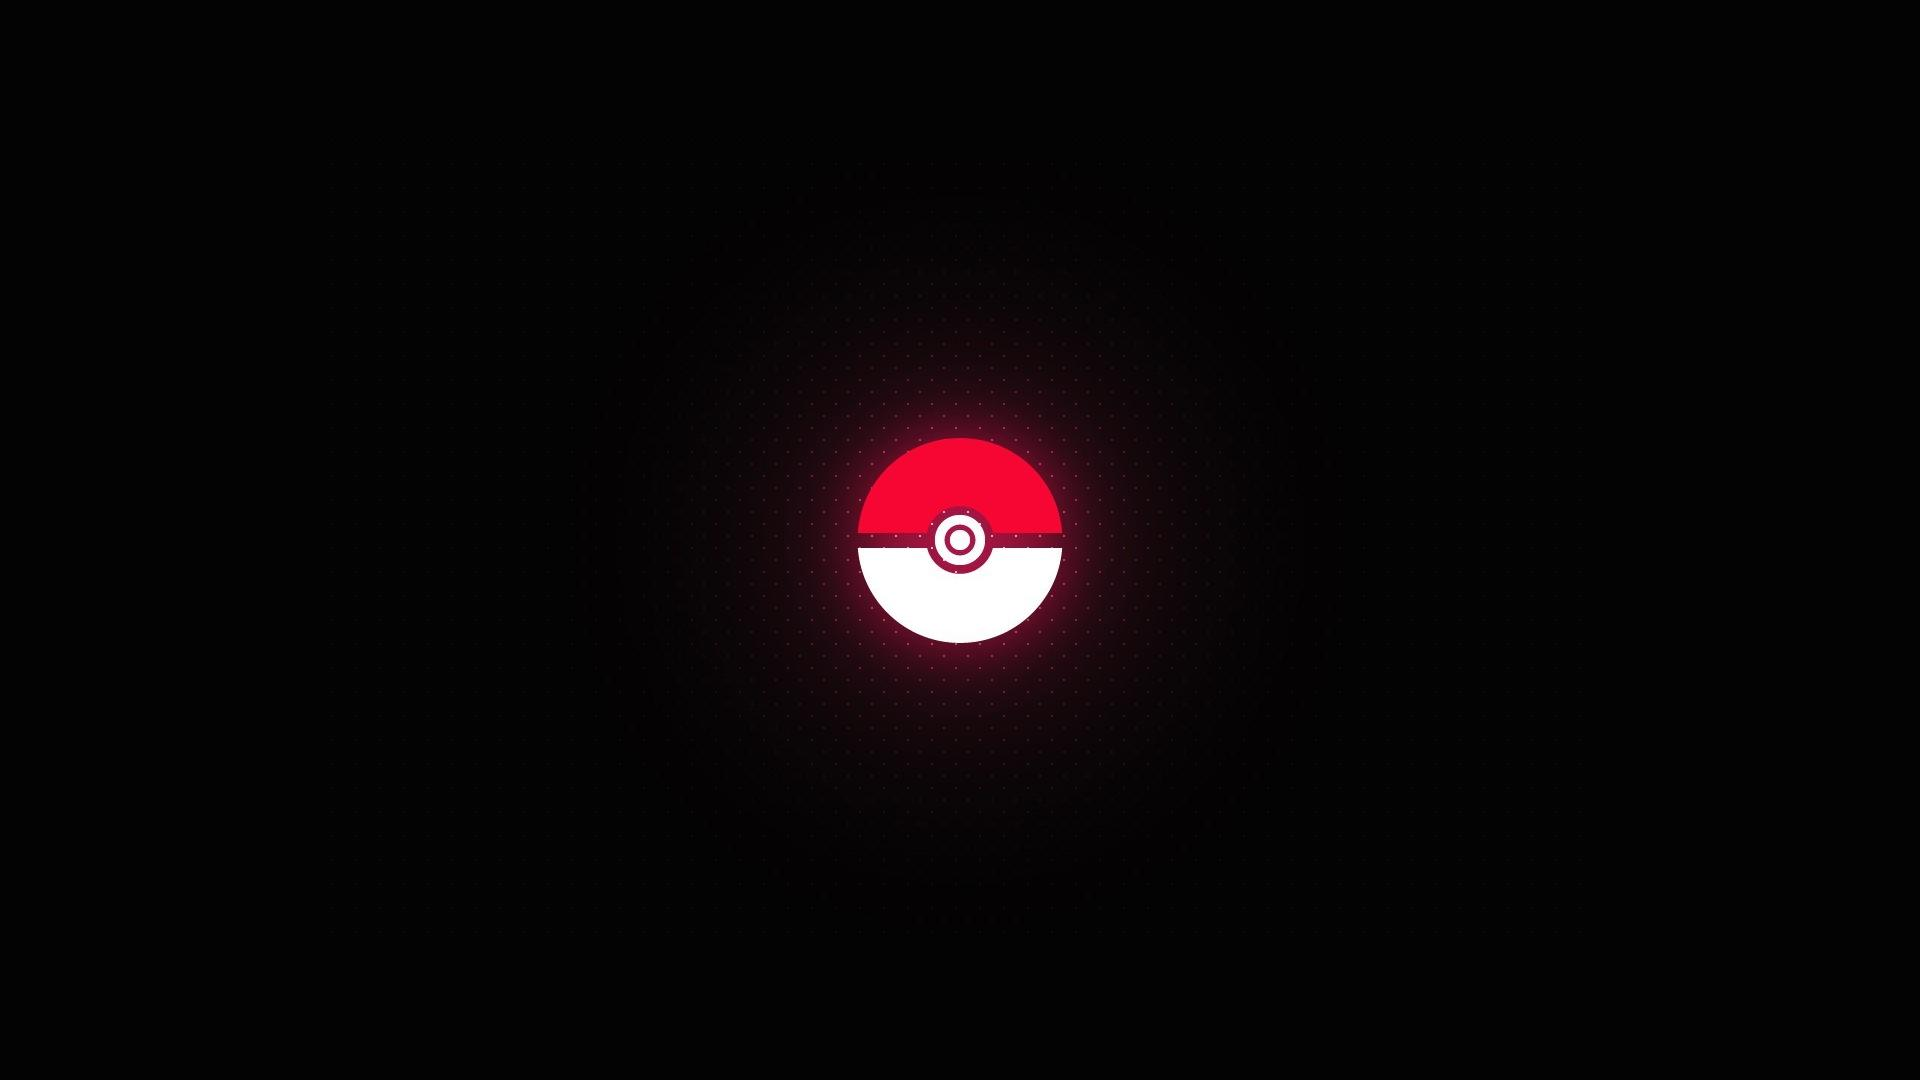 Pokemon minimalistic pokeball wallpaper 28852 1920x1080